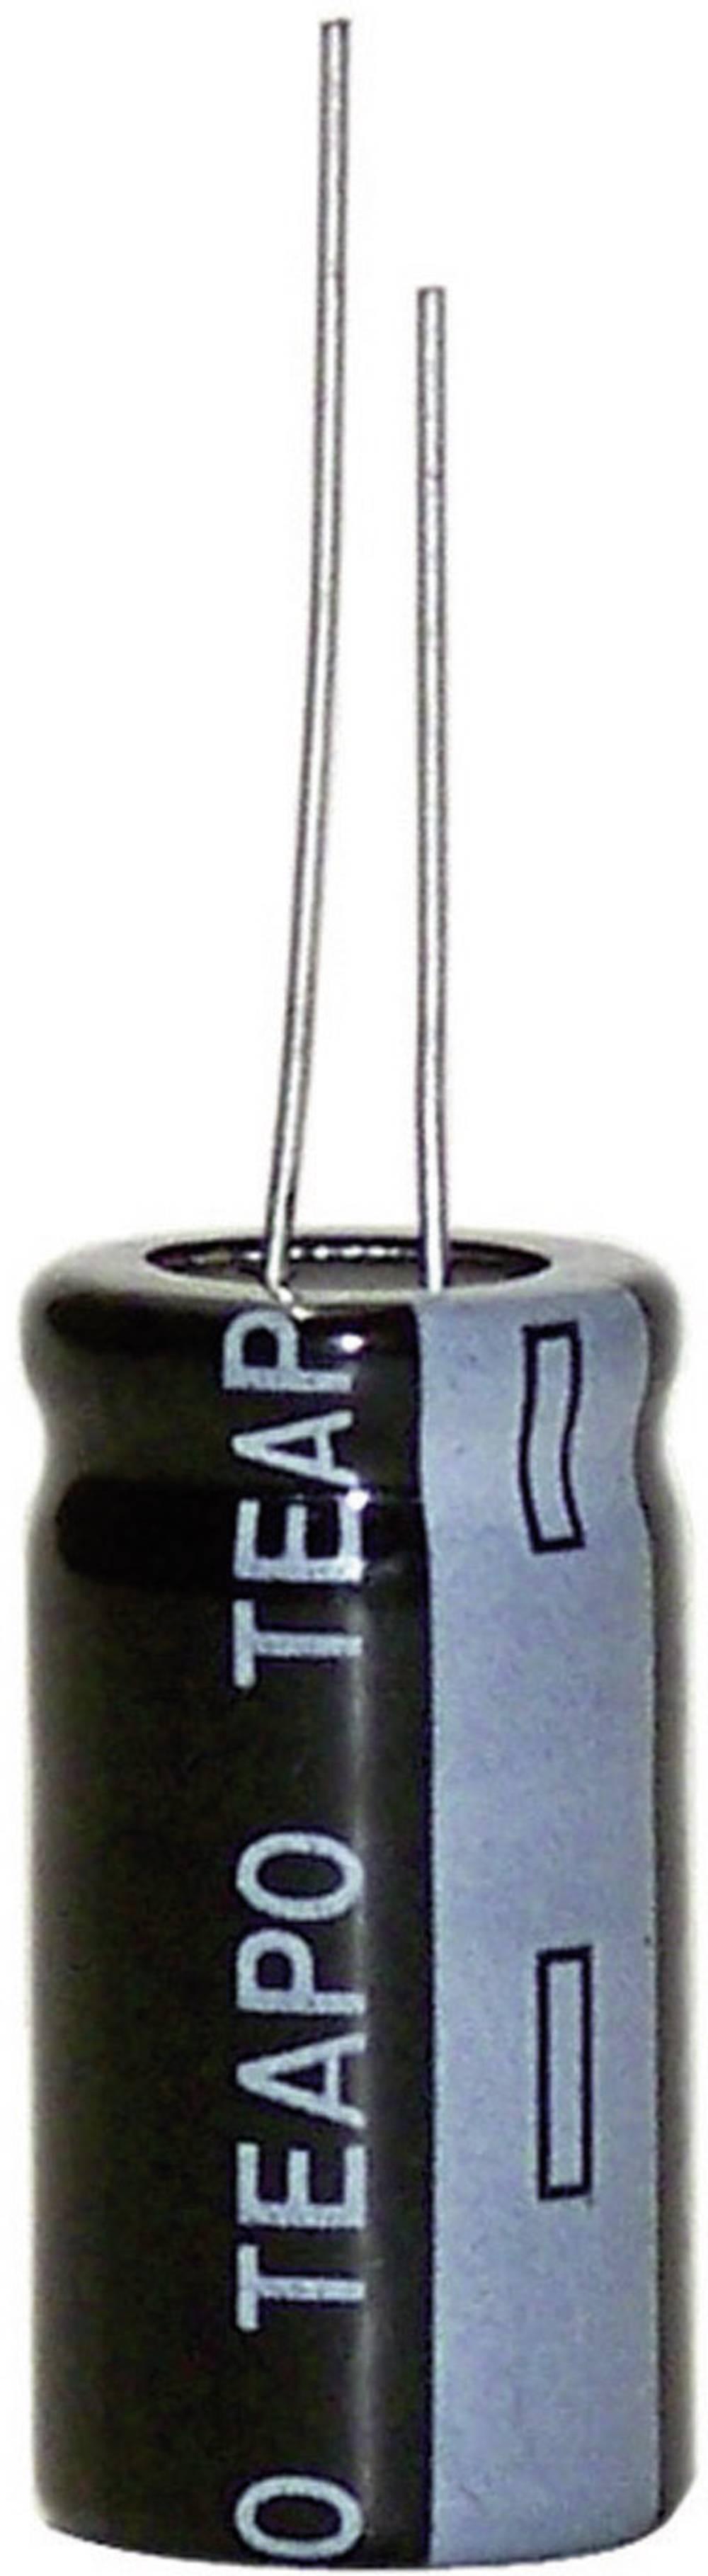 Elektrolitski kondenzator radijalni ožičeni 2.5 mm 22 µF 35 V 20 % ( x V) 6.3 mm x 7 mm KSS226M035S1A5E07K 1 kom